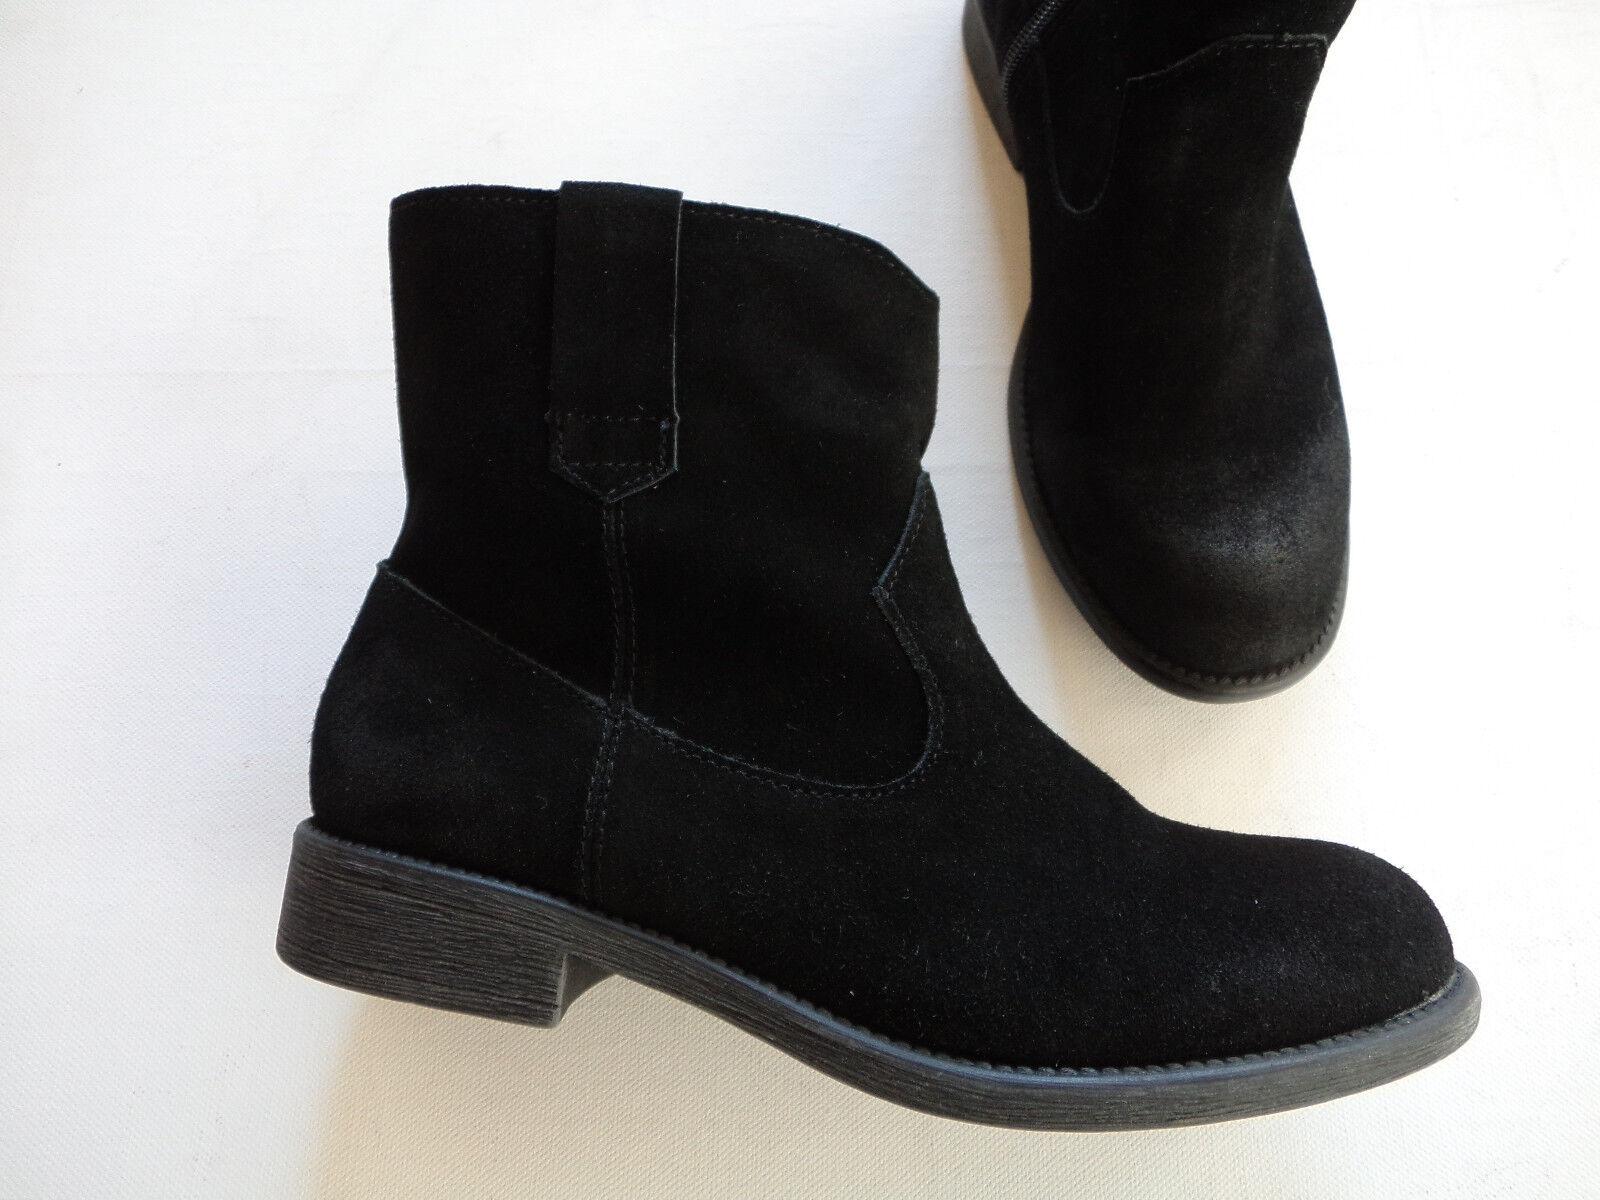 NEU BLACK Chelsea Boots Stiefelette black used Look echt Leder Größe 37 - 42